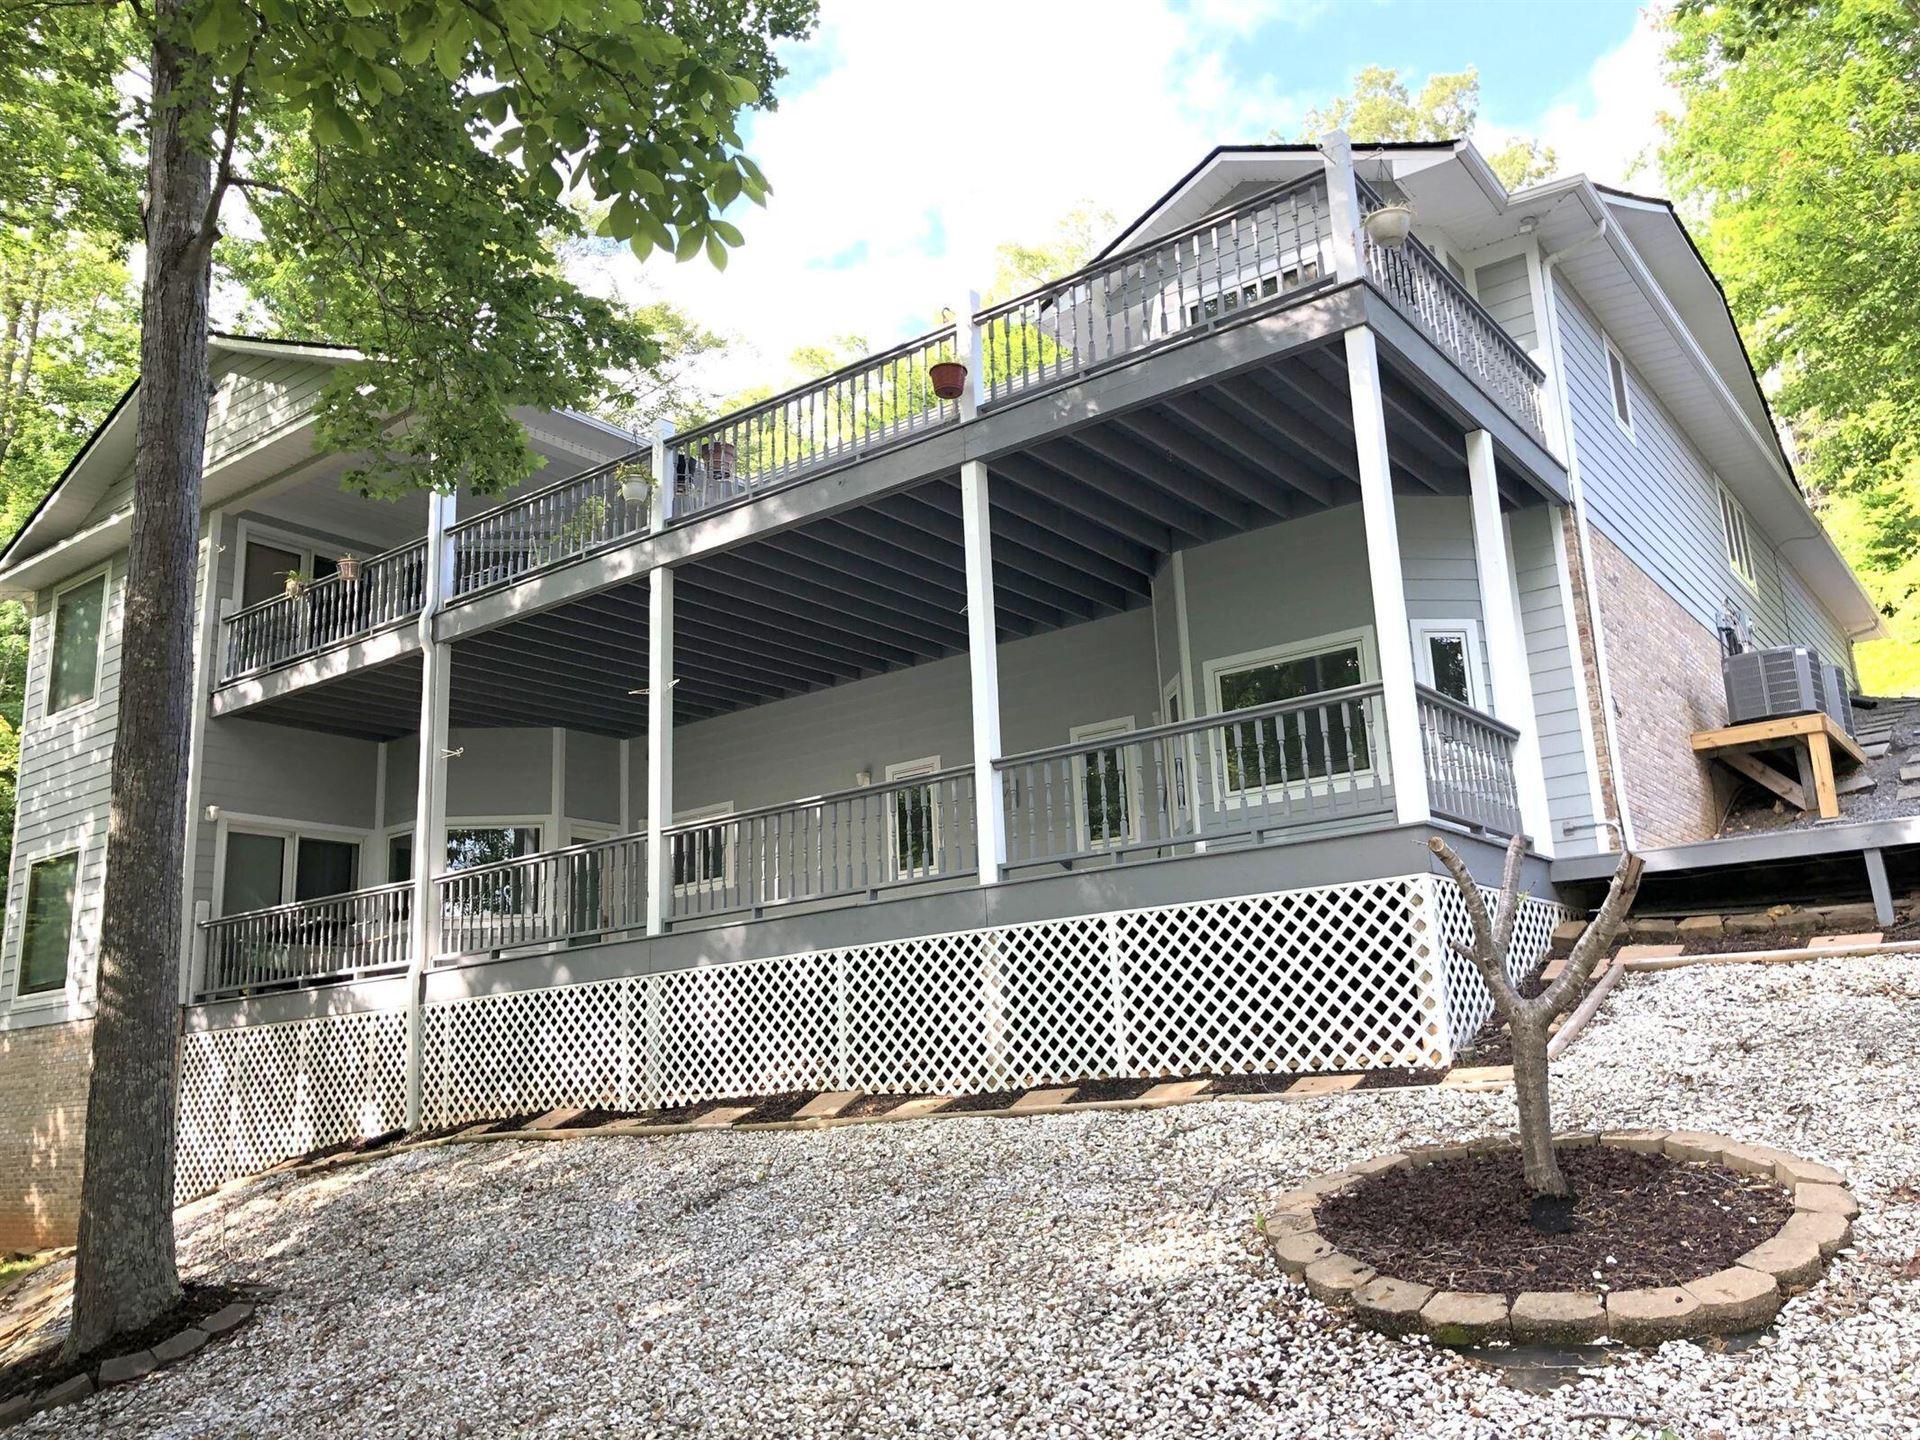 Photo of 1649 Cove Pointe Rd, LaFollette, TN 37766 (MLS # 1167900)